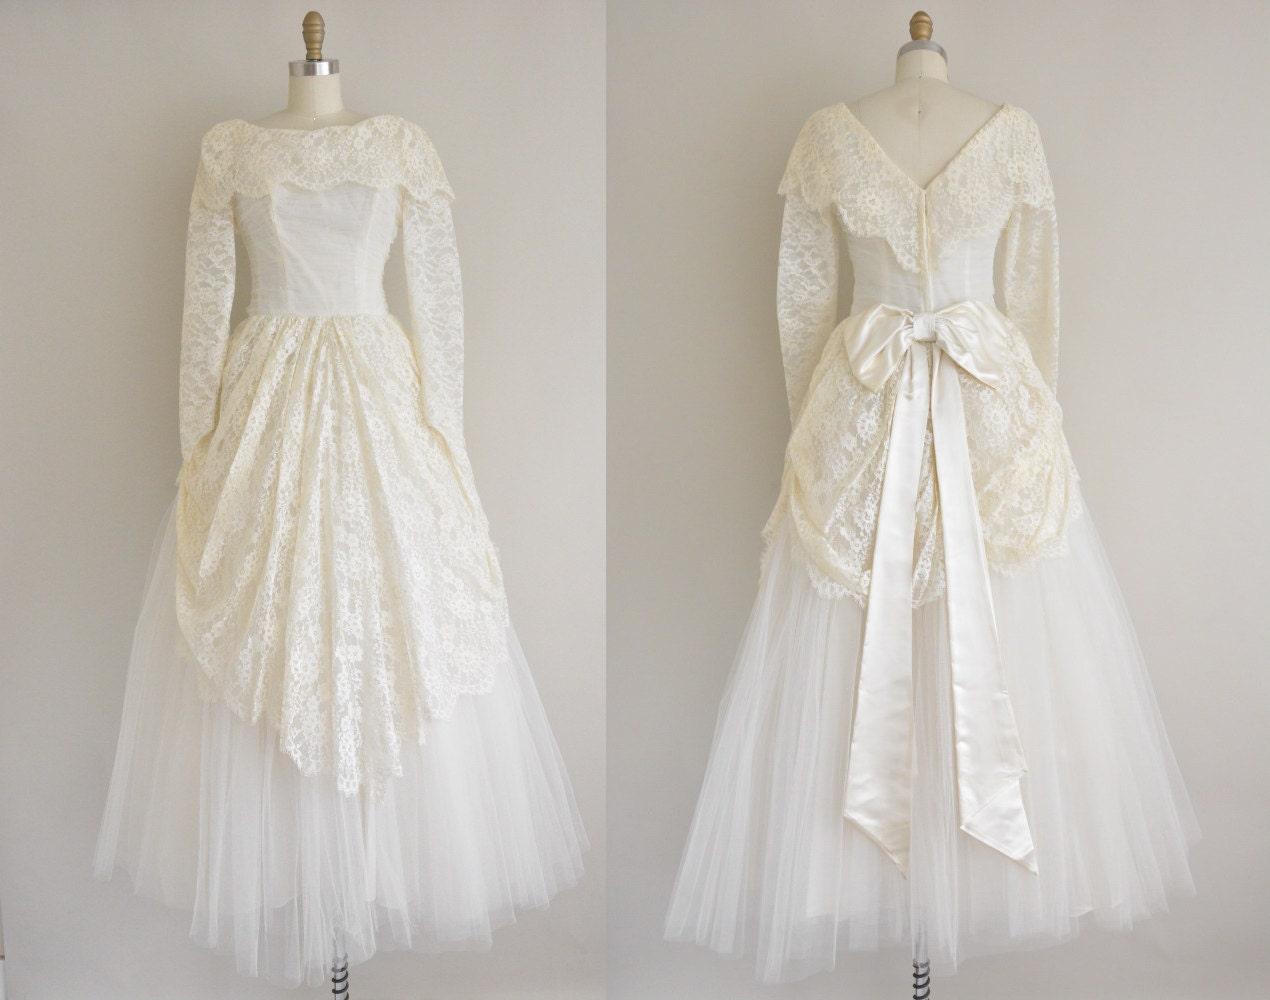 Classic Wedding Dress Satin: Vintage 1950s Wedding Dress / Satin Bowtie Dress / 50s Lace